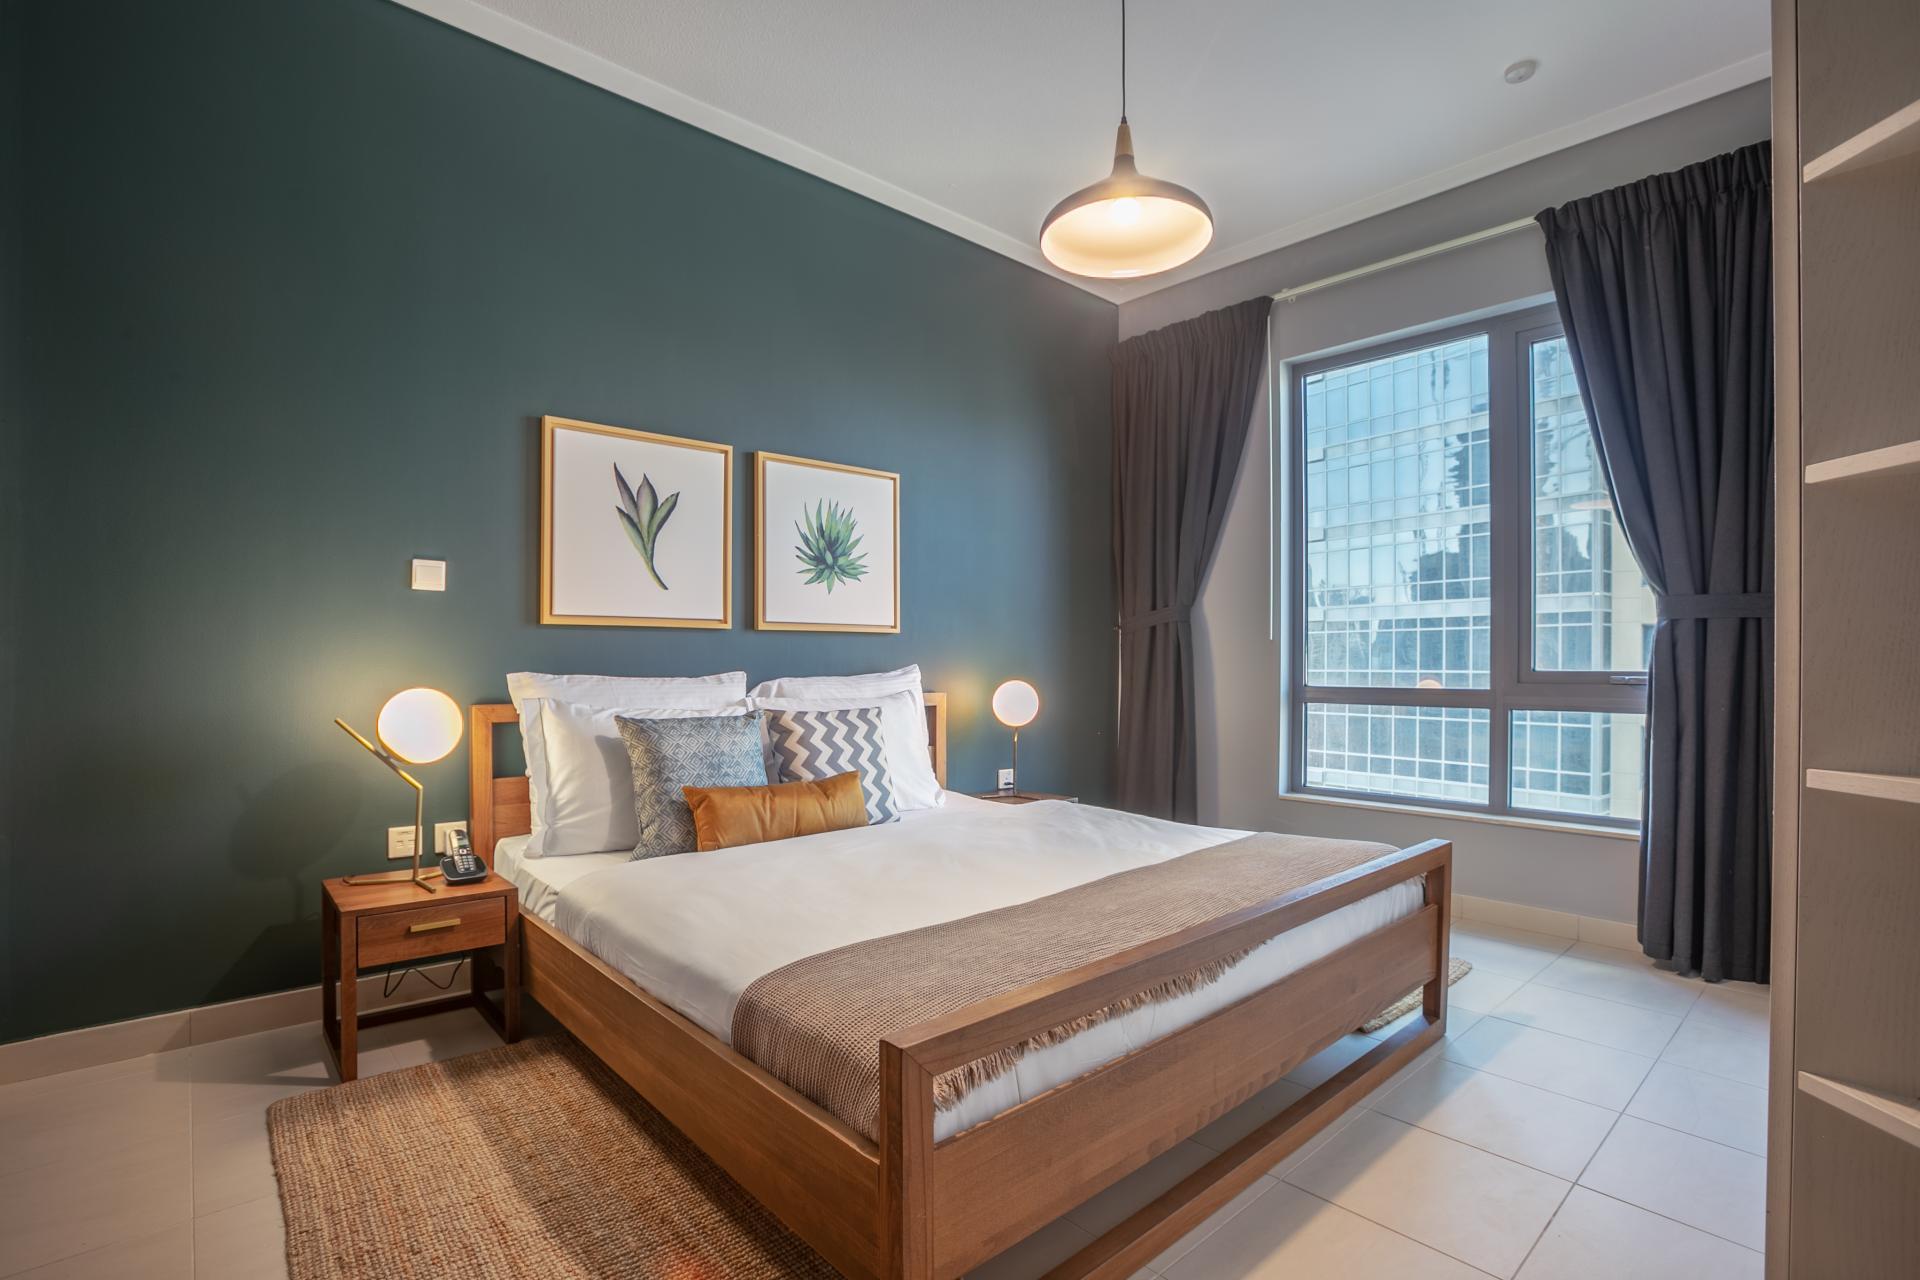 Bed at South Ridge Apartment, Financial District, Dubai